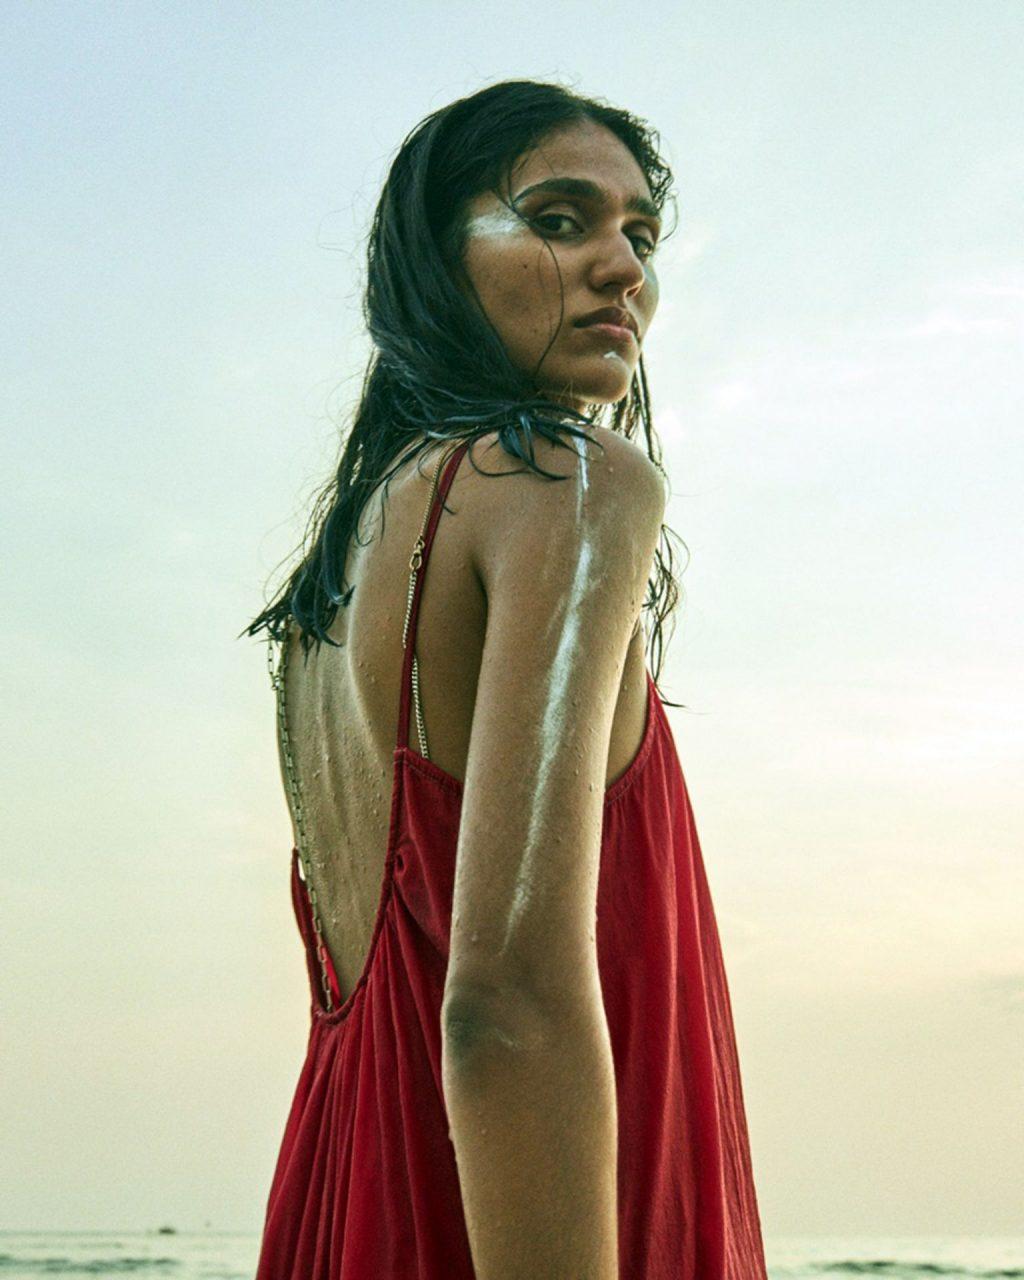 Hannah Wick, Nikki McGuire, Priya Jain Pose for All Saints Campaign (9 Photos)